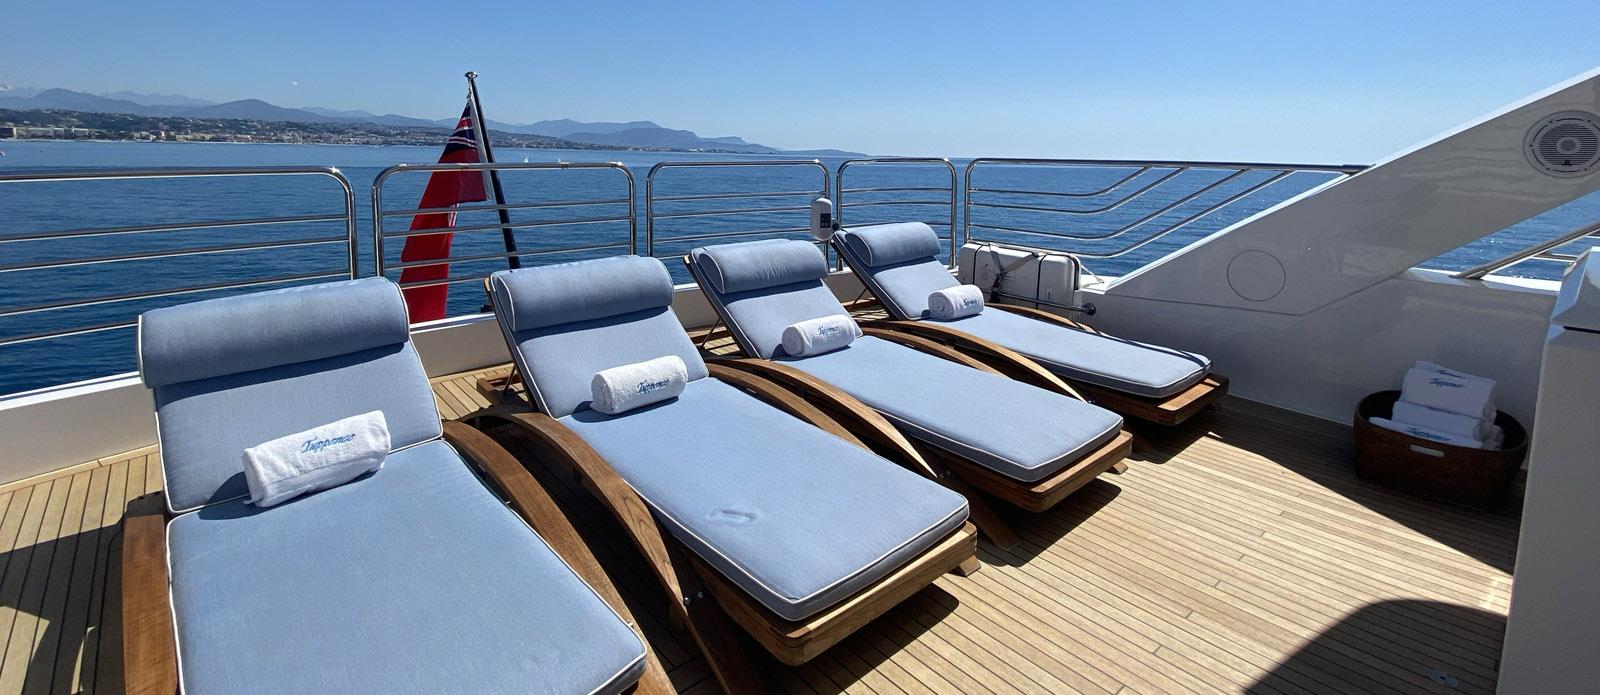 Sunbathing-Tuppence-Sunseeker 30m Yacht